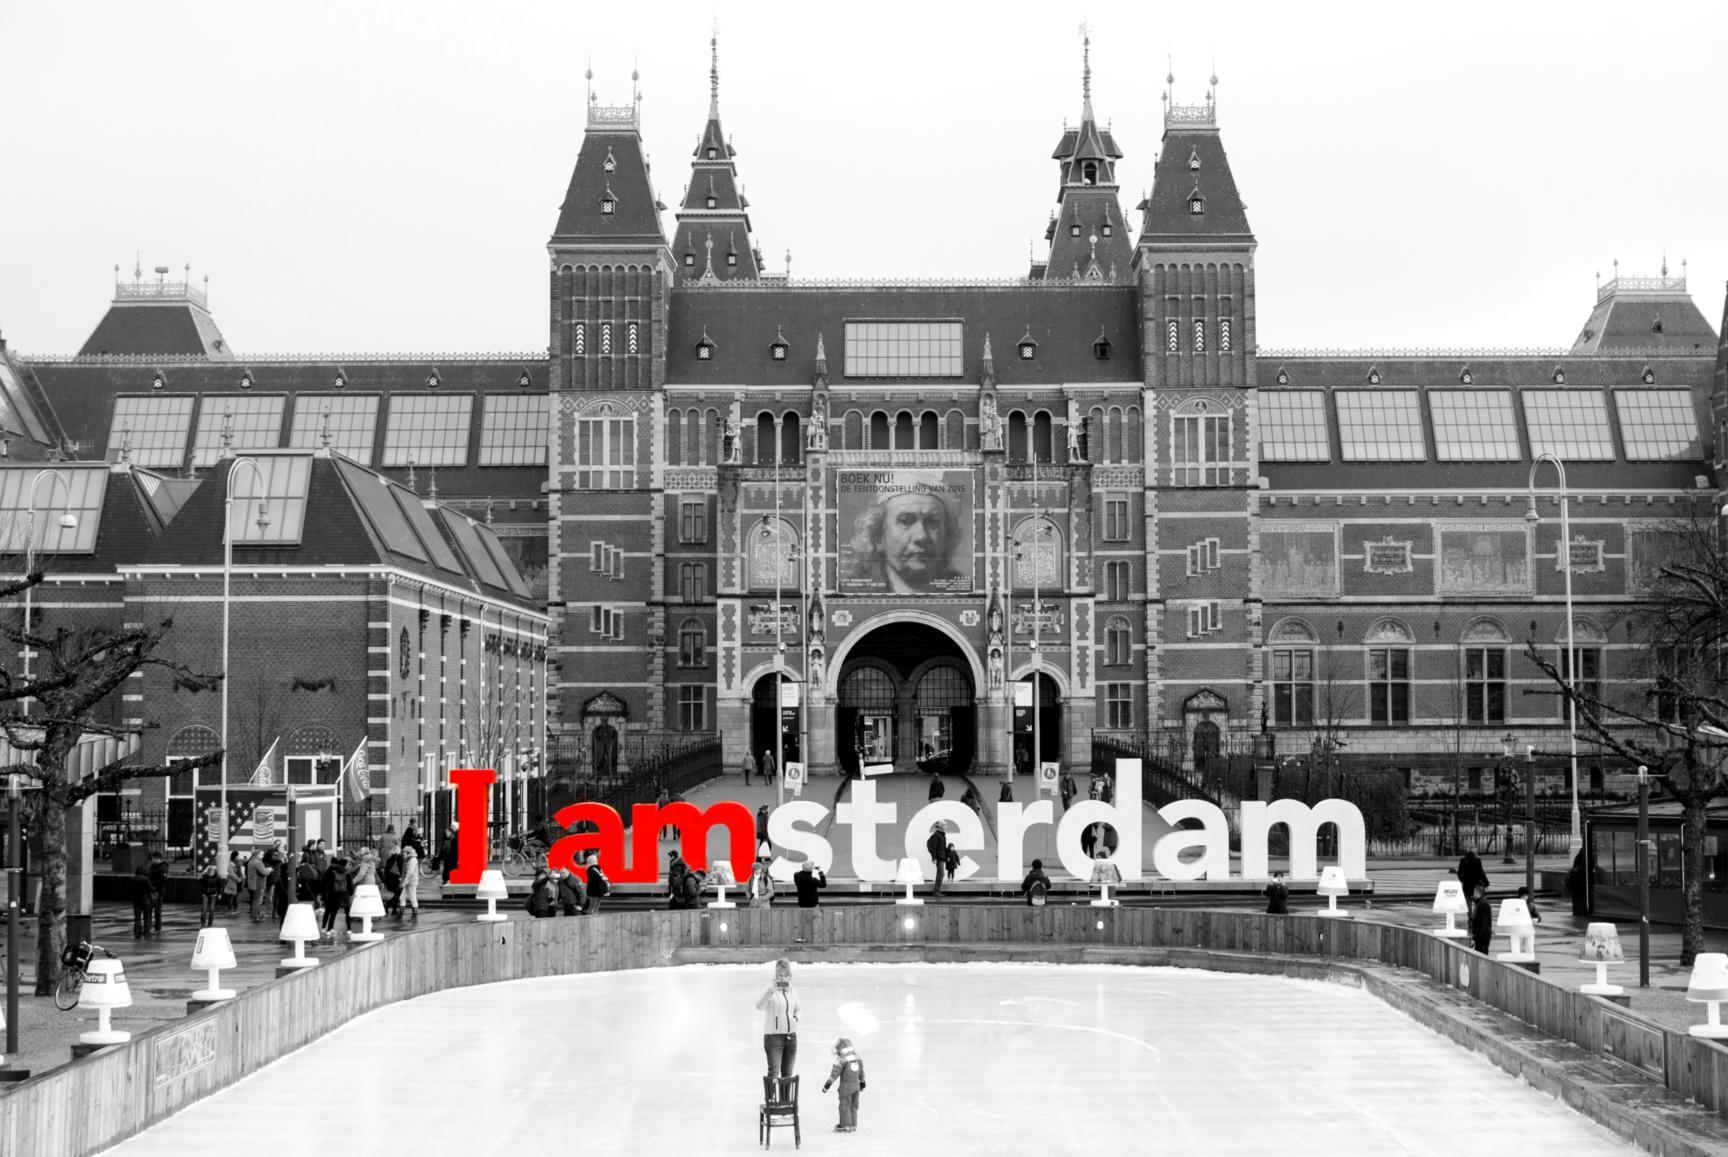 'I amsterdam' y Rijksmuseum, en Museumplein. Ámsterdam 2015.